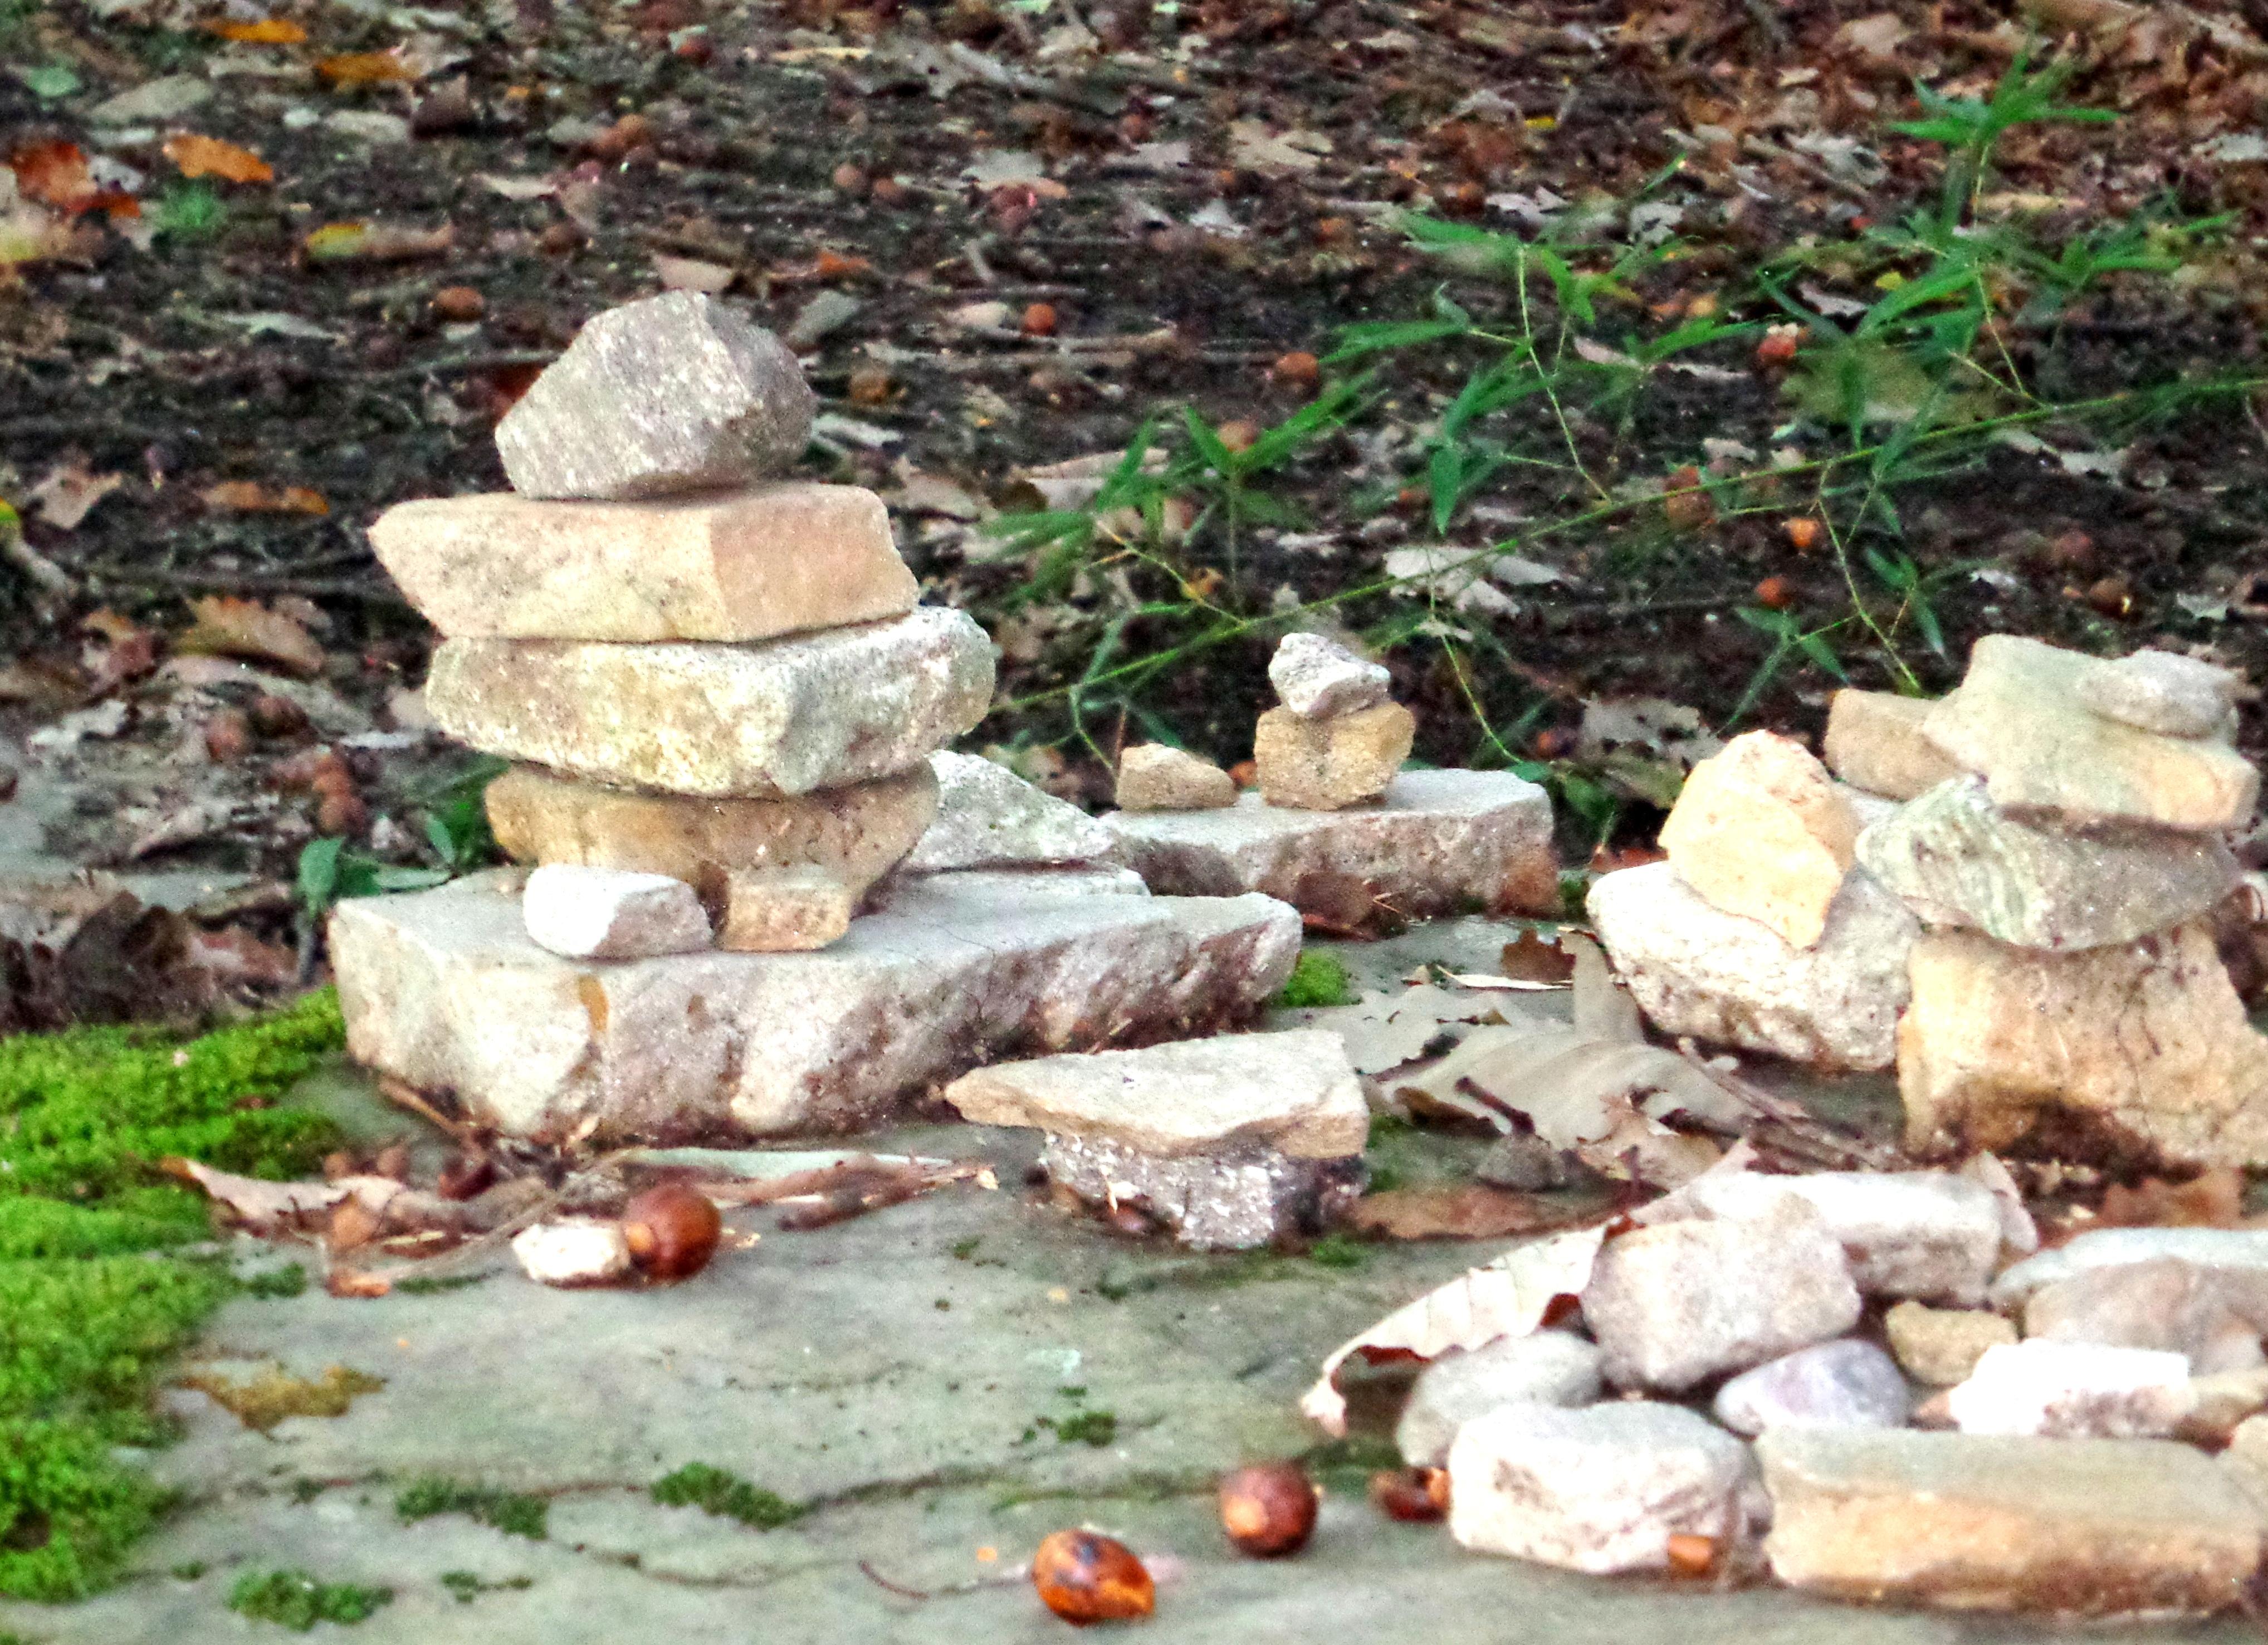 All About Zen Gardens | The Art of Zen Gardens in Zen Buddhism